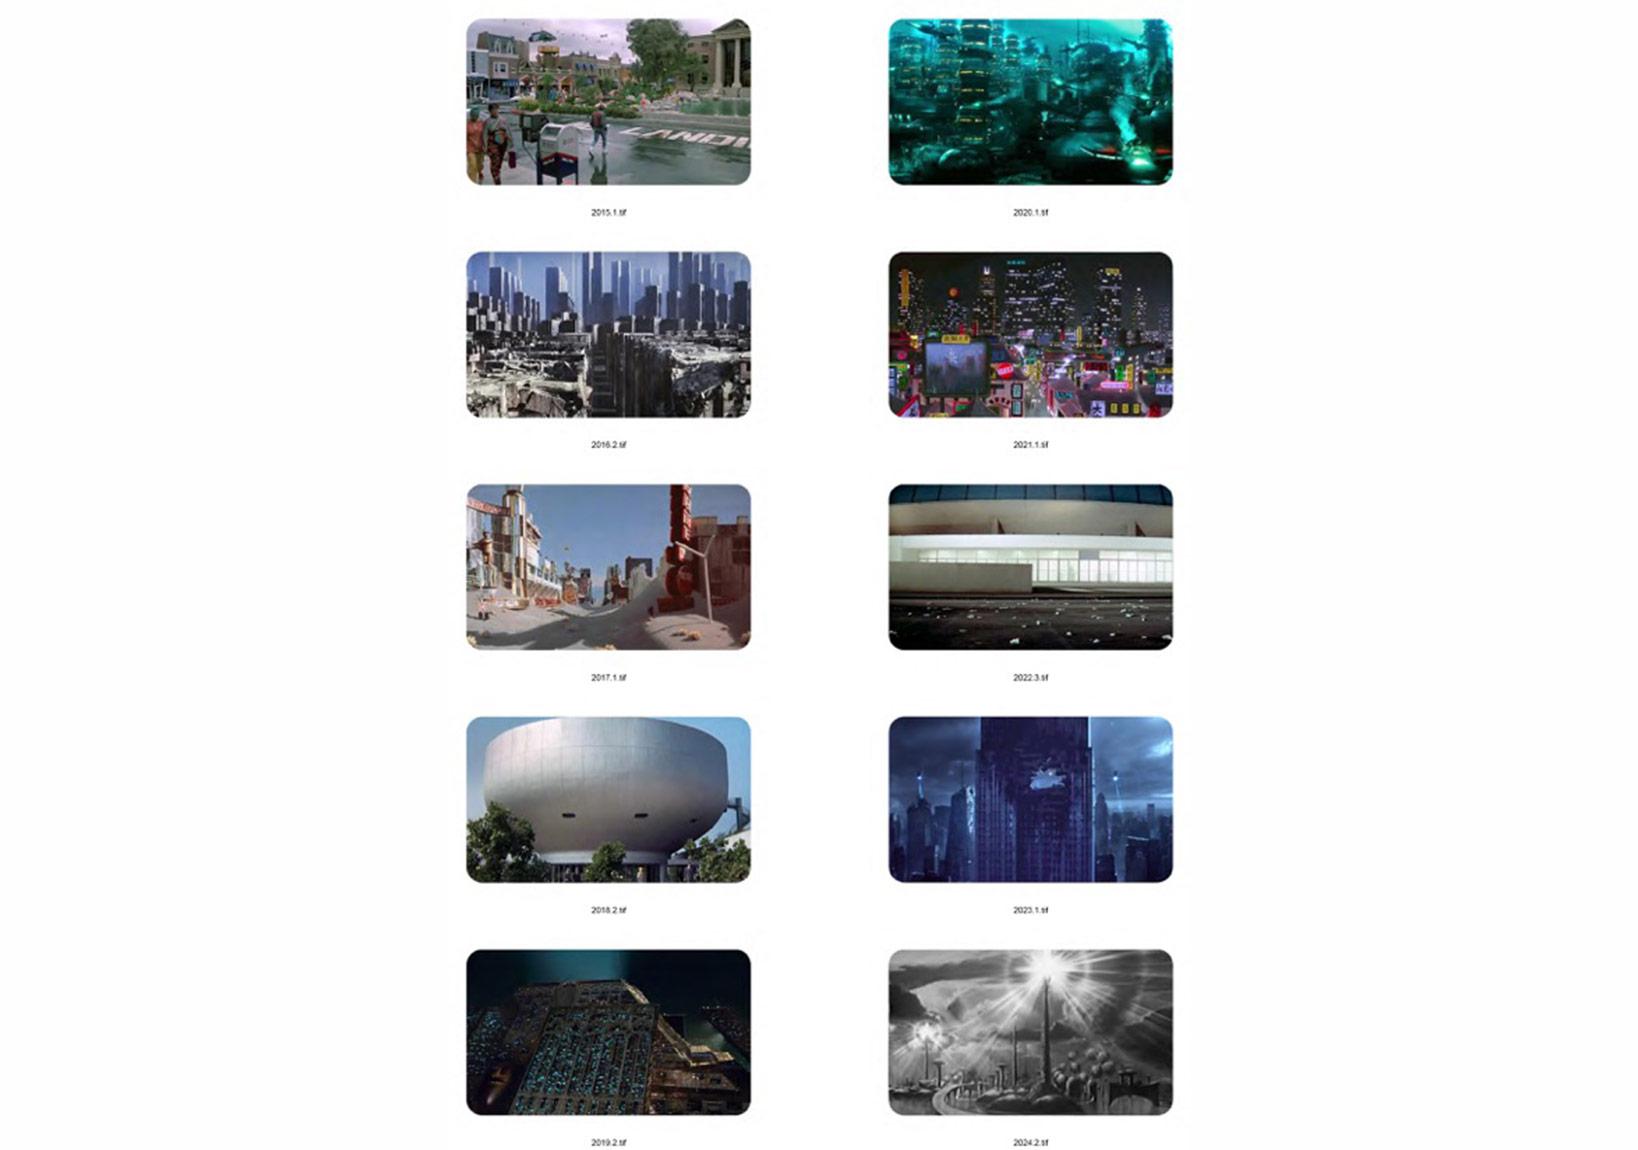 Andrea Canepa2015. Arquitecturas del futuro pasado, 201582 Photographies27 x 22 cm (each one)